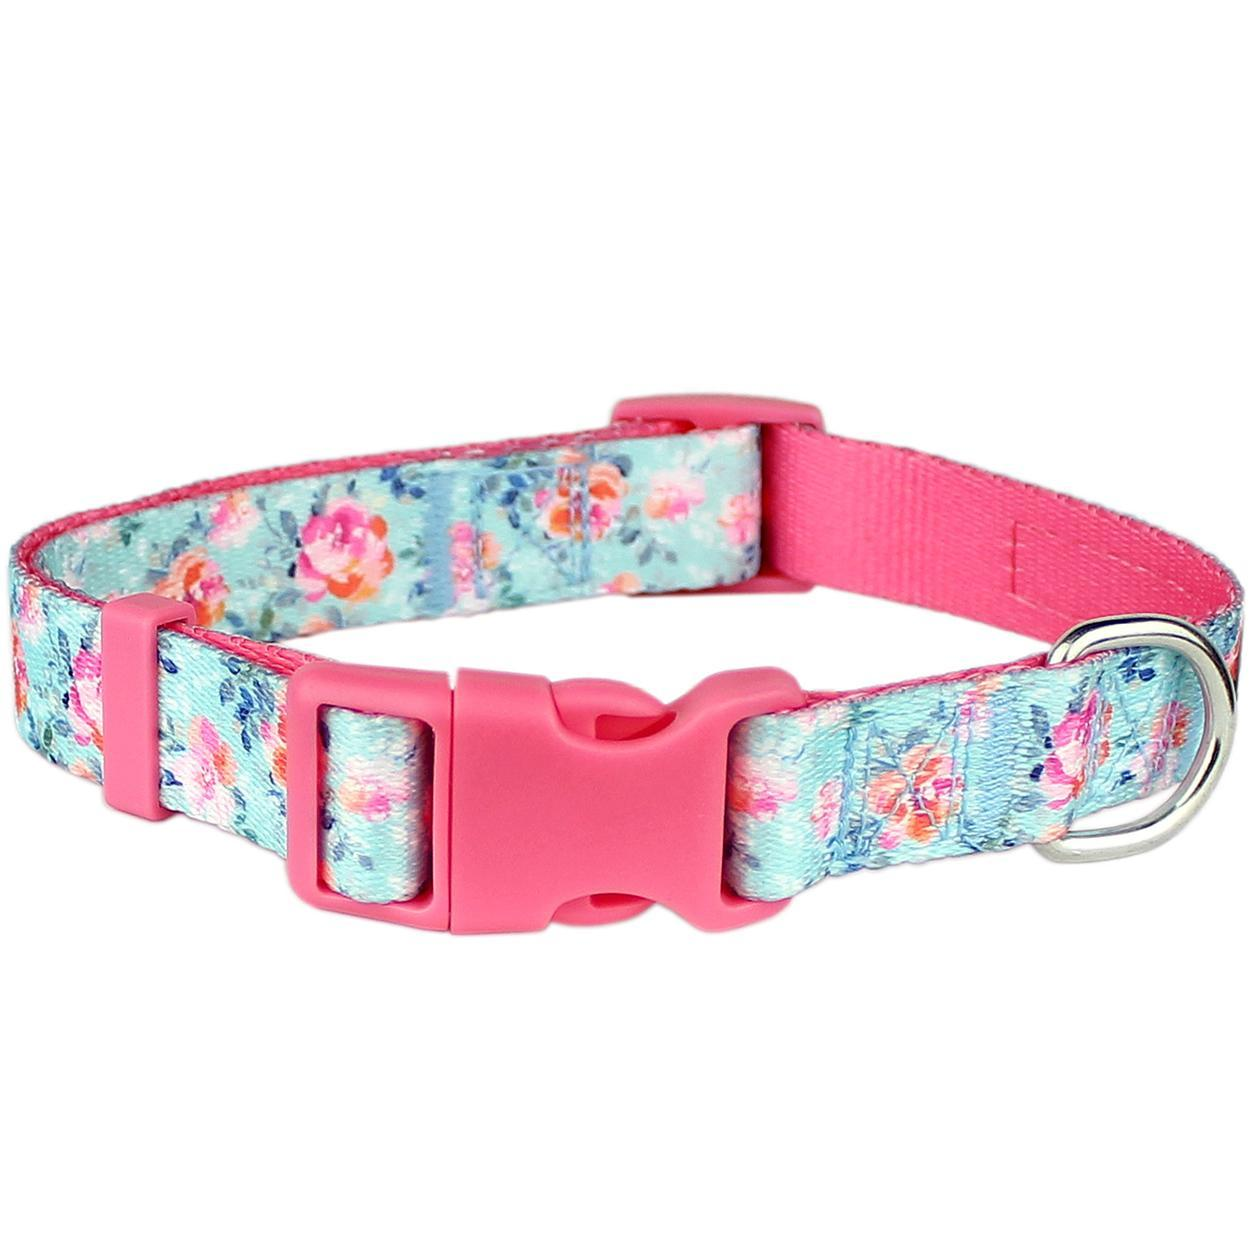 Parisian Pet Spring Blossoms Dog Collar